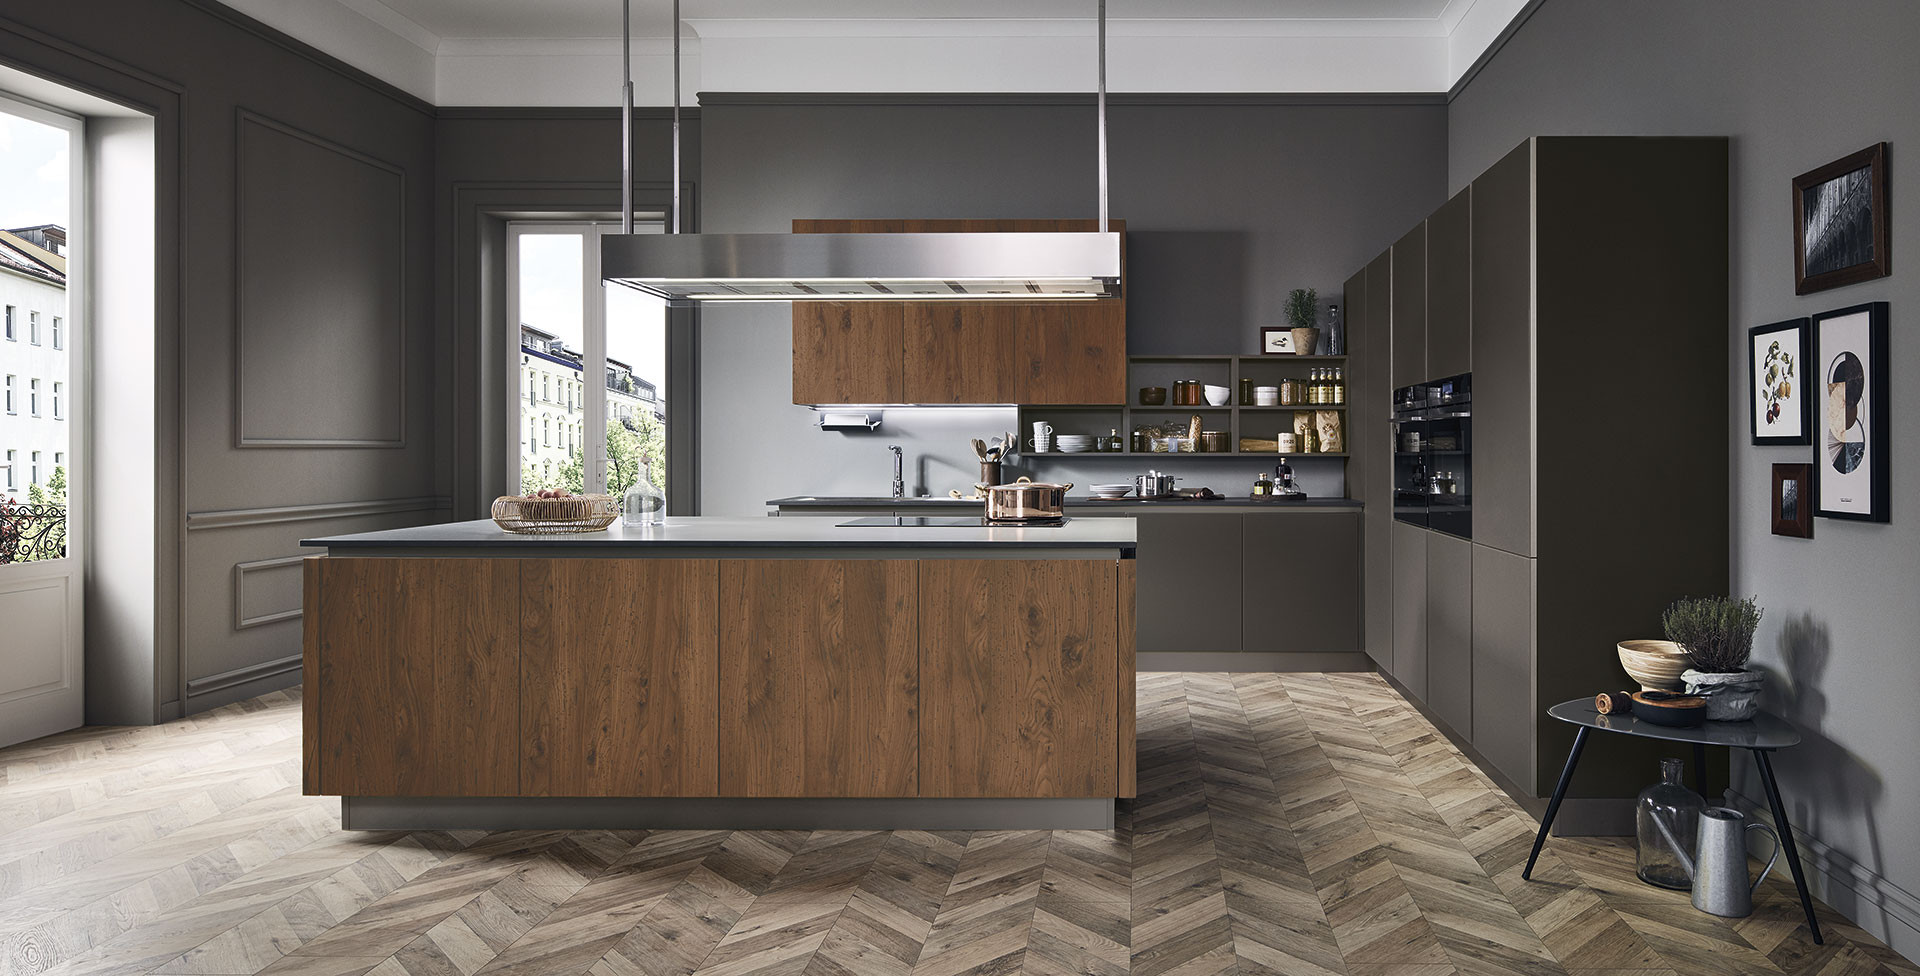 Ante Cucina In Vetro.Kitchen Ri Flex Veneta Cucine